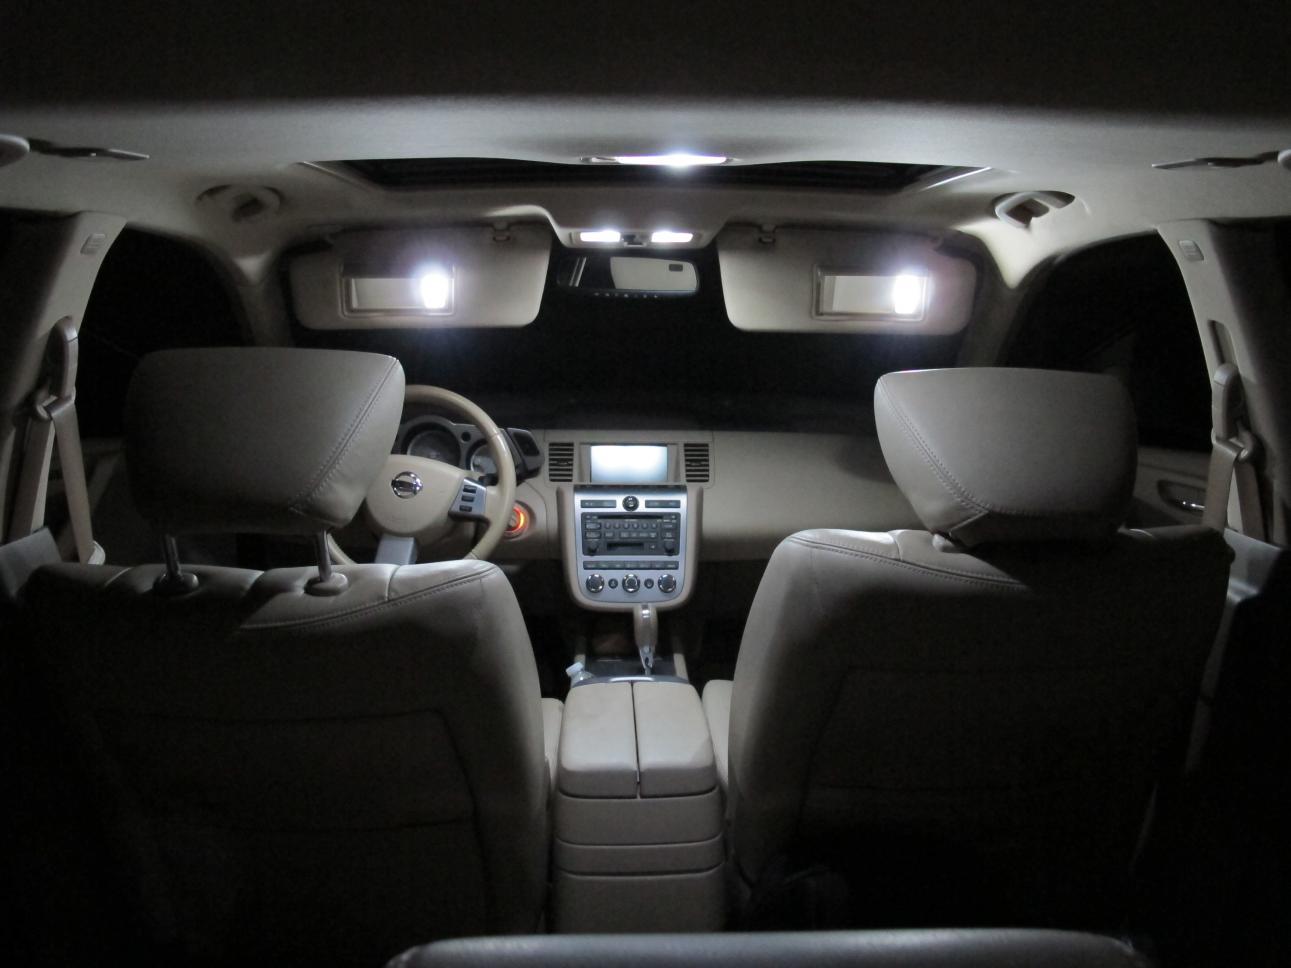 Interior Lights Swap Nissan Murano Forum